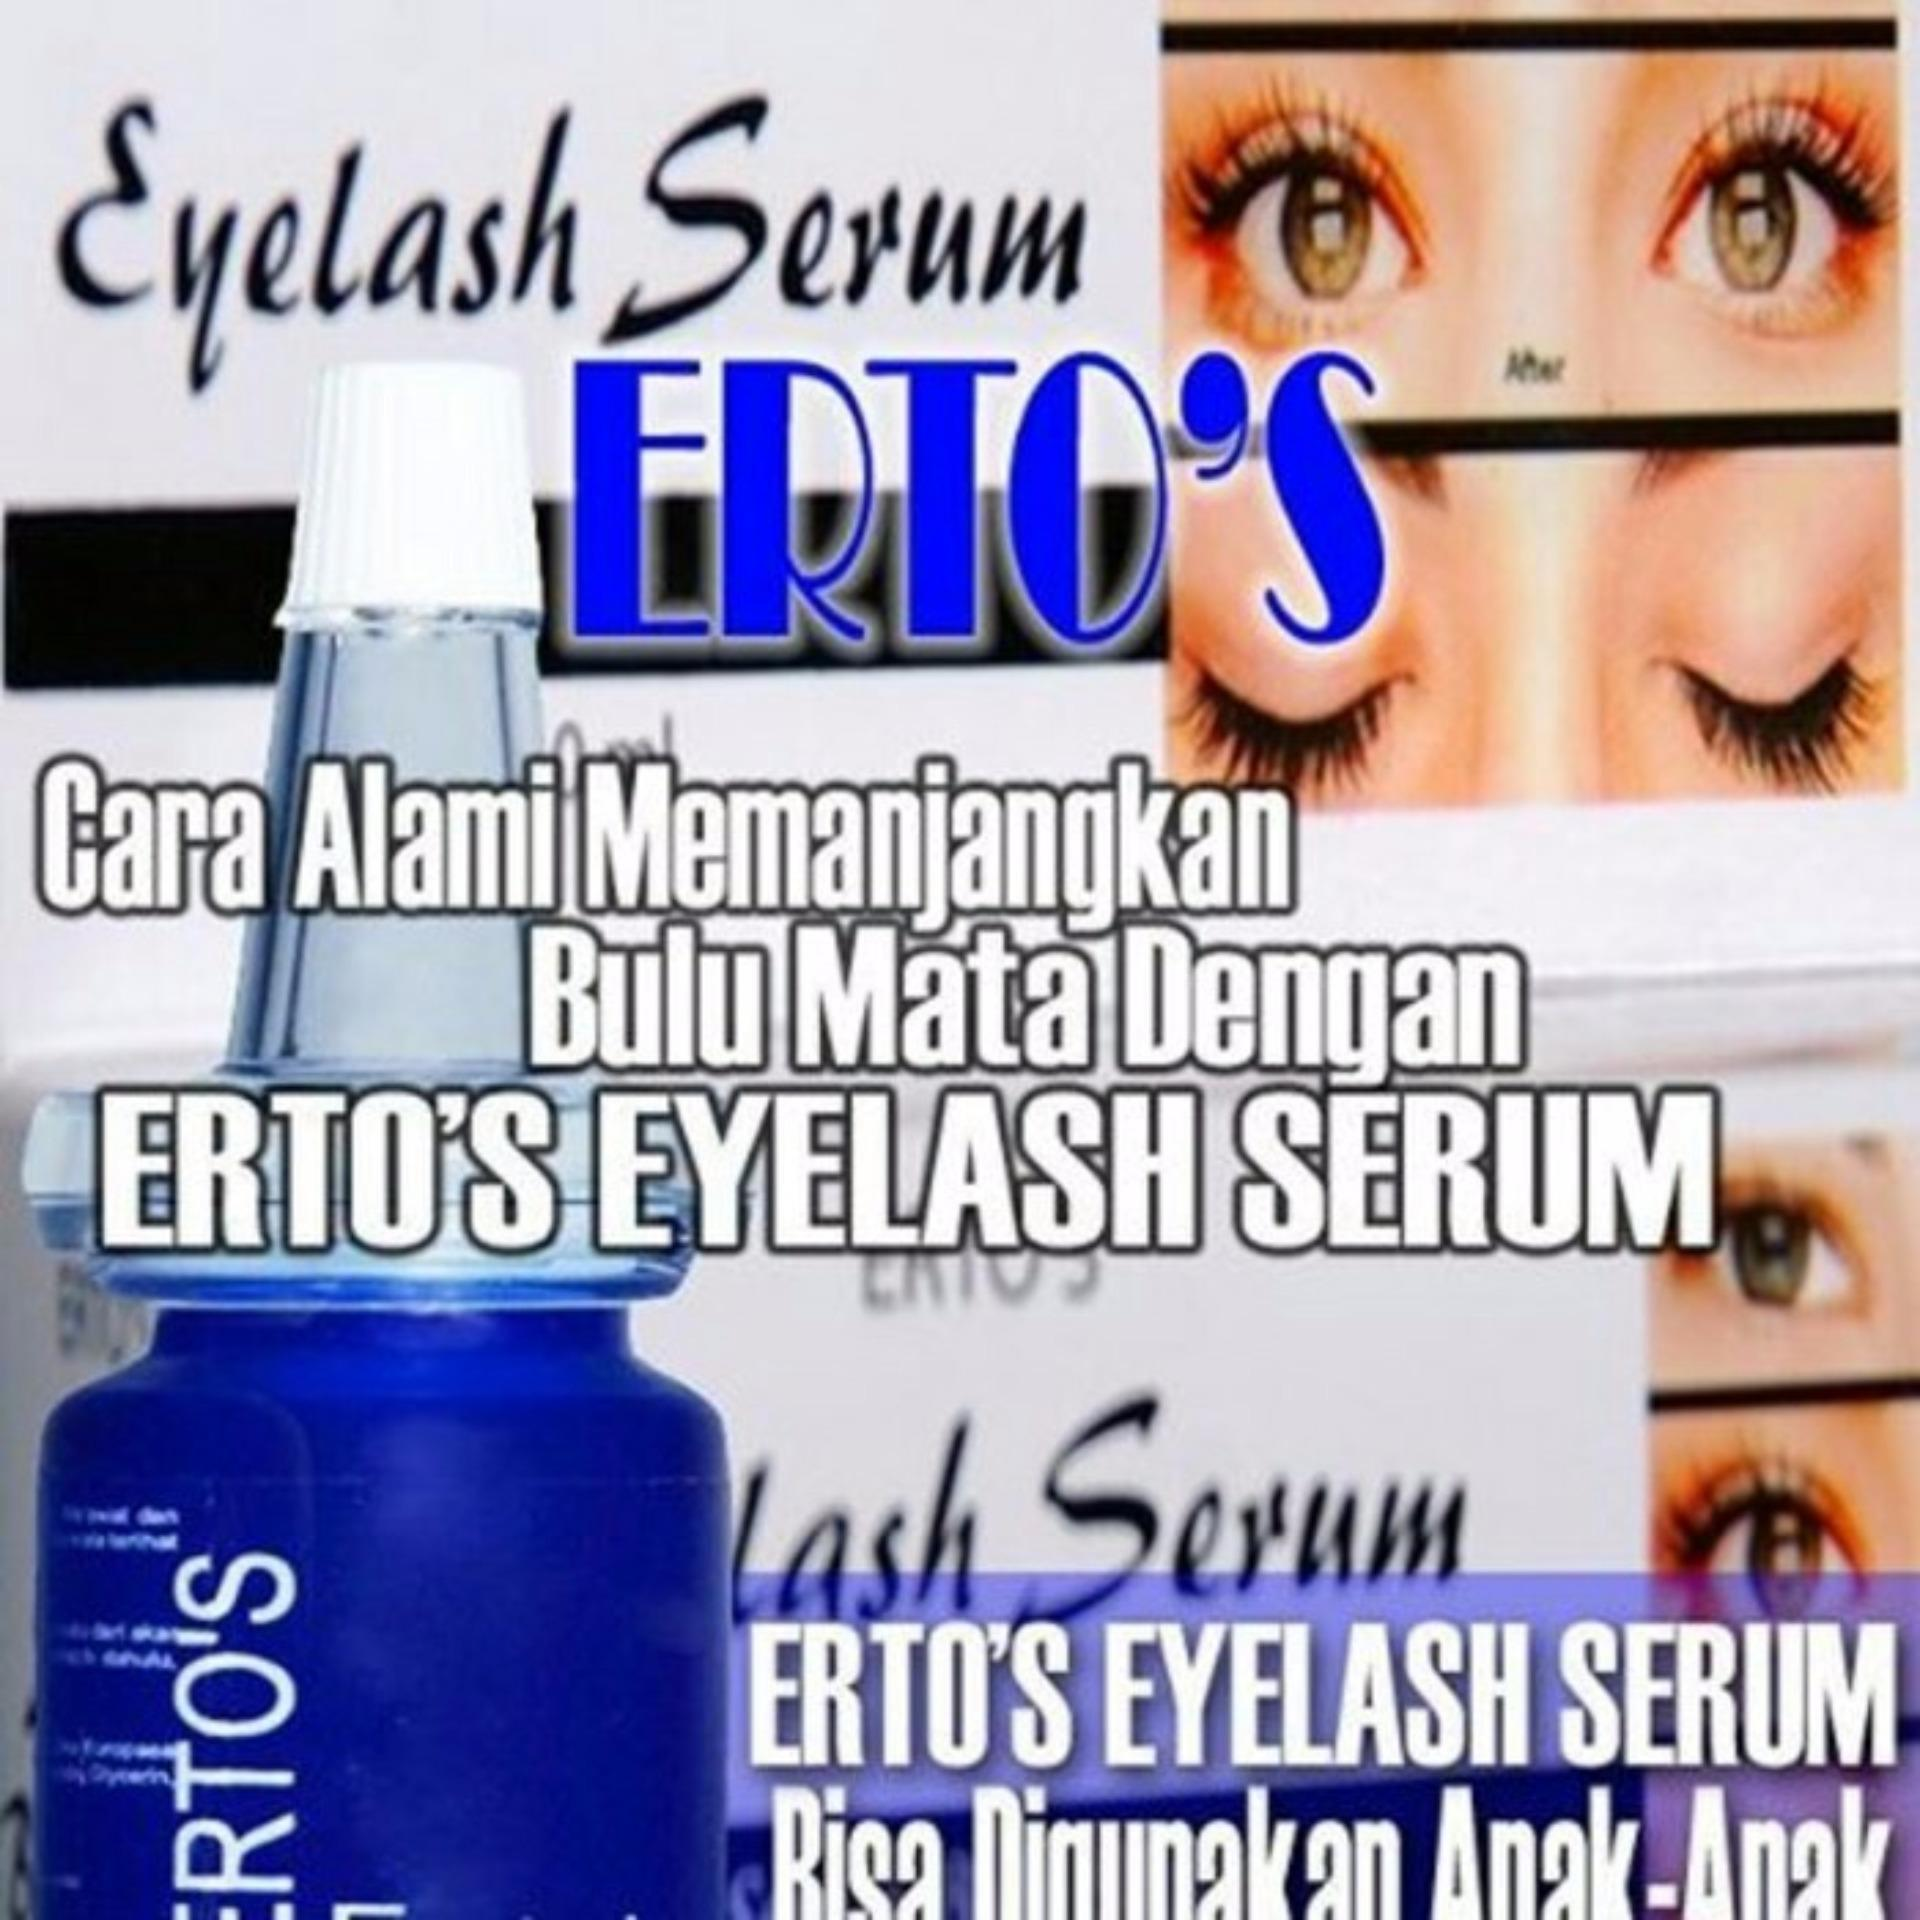 Cari Bandingkan Ertos Eyelash Serum Pelentik Bulu Mata Harga Penawaran Pelebat Vitamin